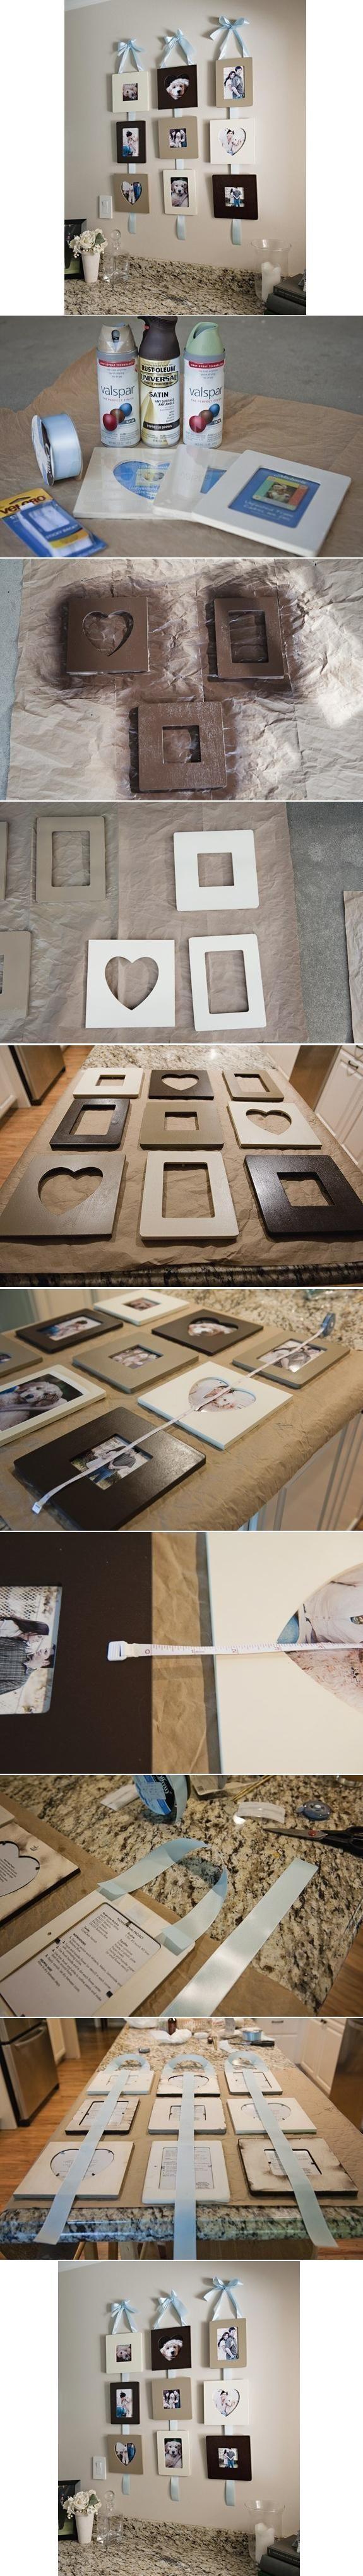 DIY Stylish Wall Photo Frame